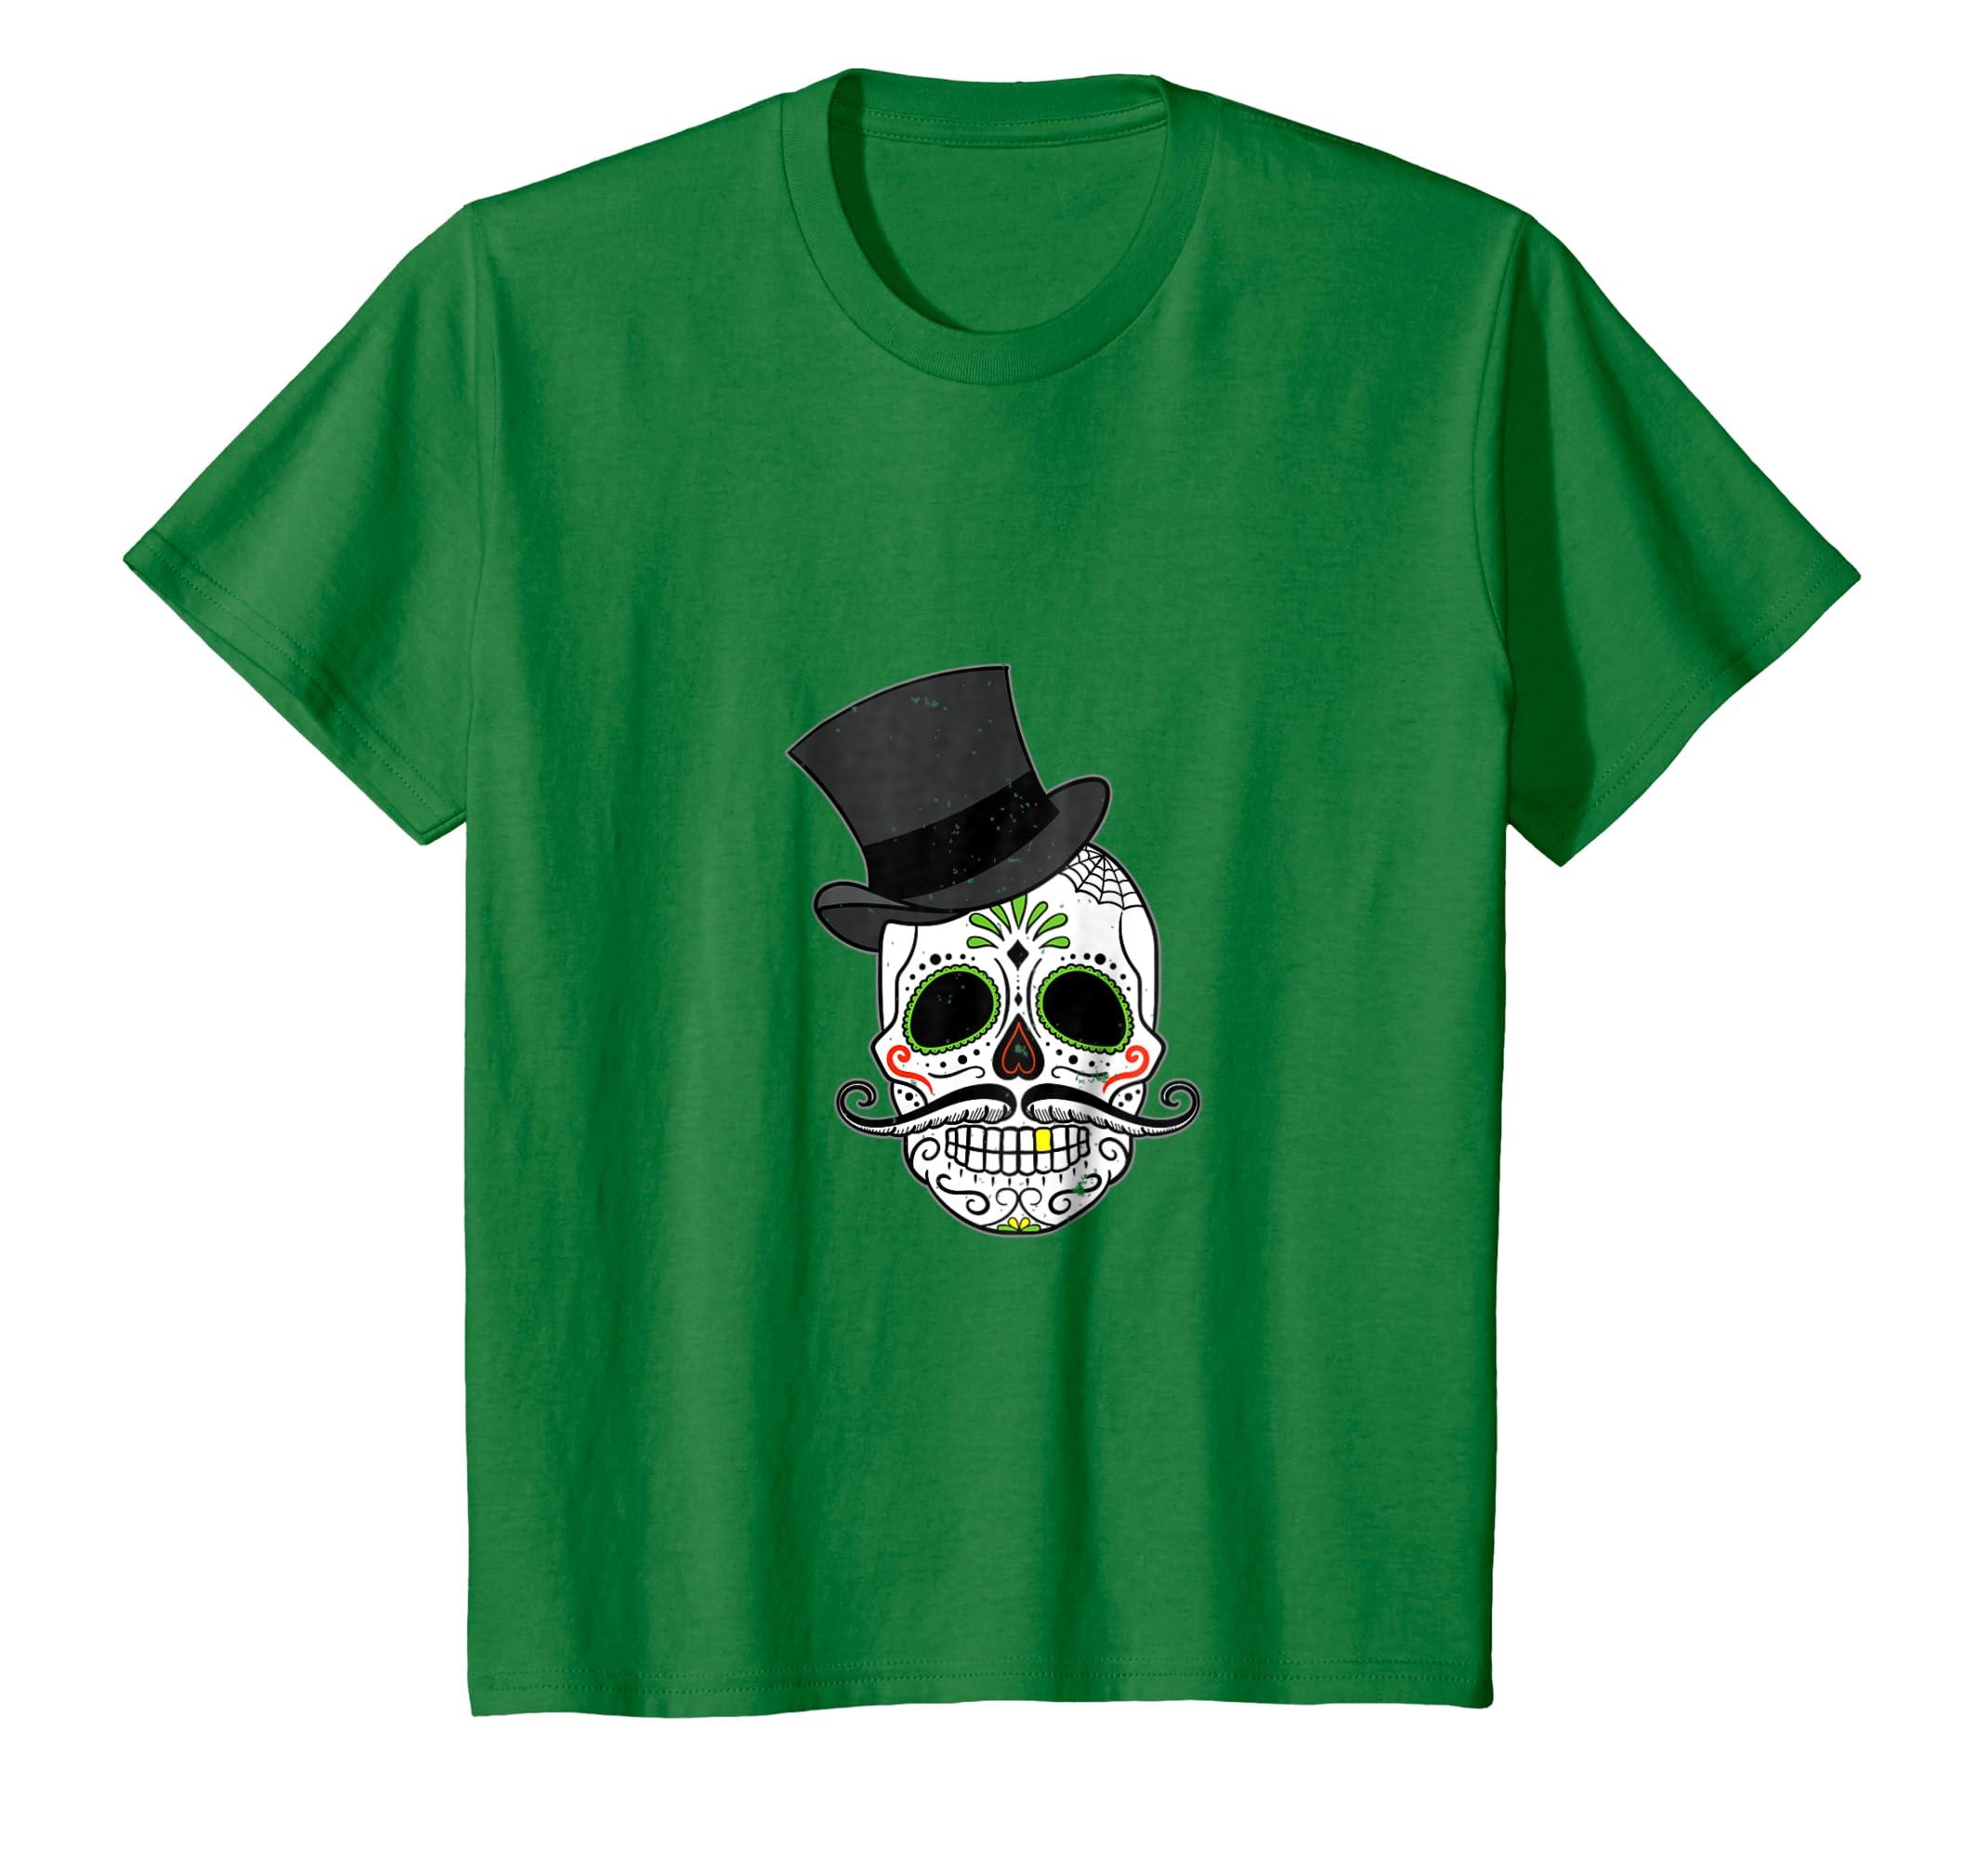 Amazon.com: Dia de Los Muertos Calavera de Azucar Camiseta T-Shirt: Clothing